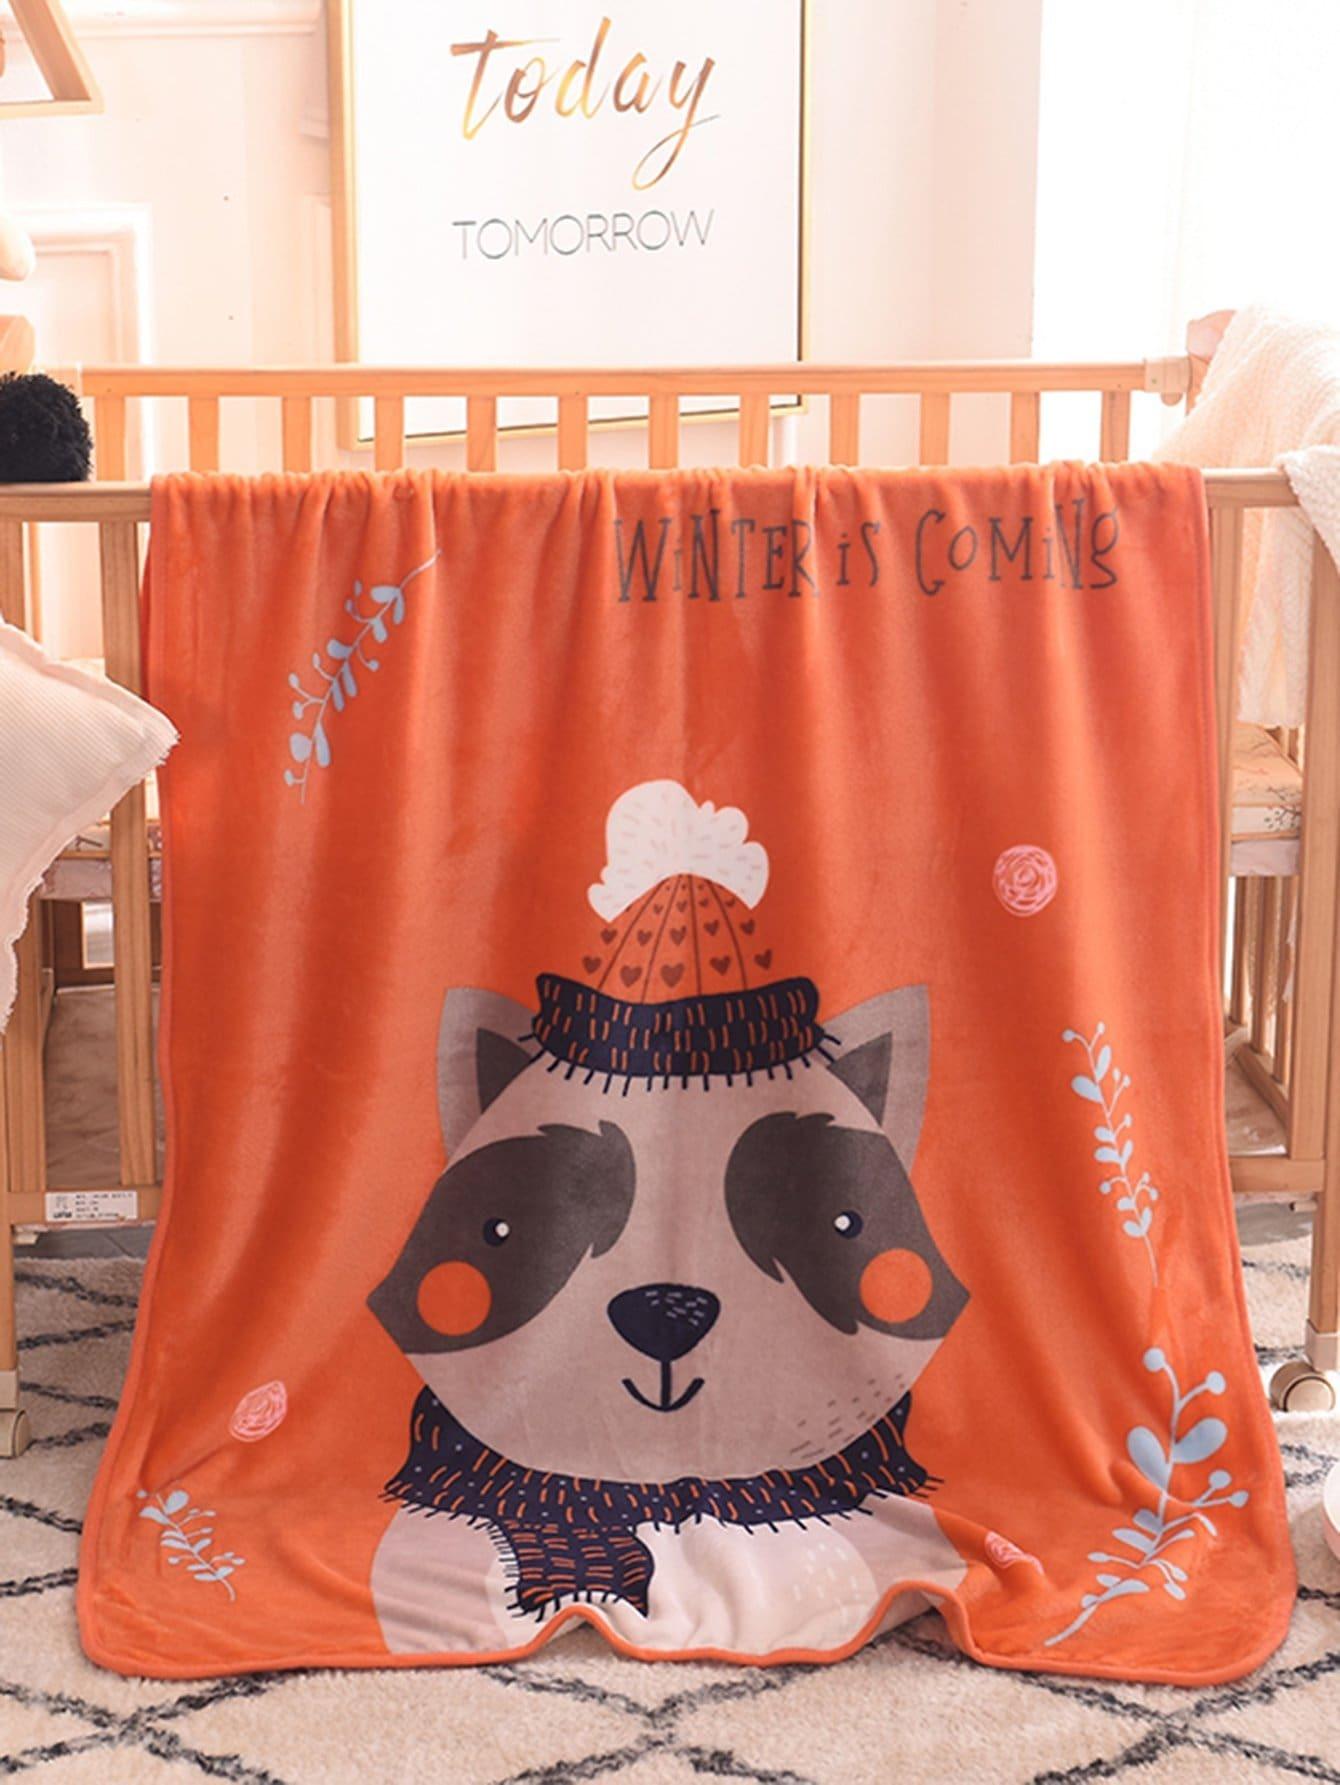 Bear Print Blanket 1 PC